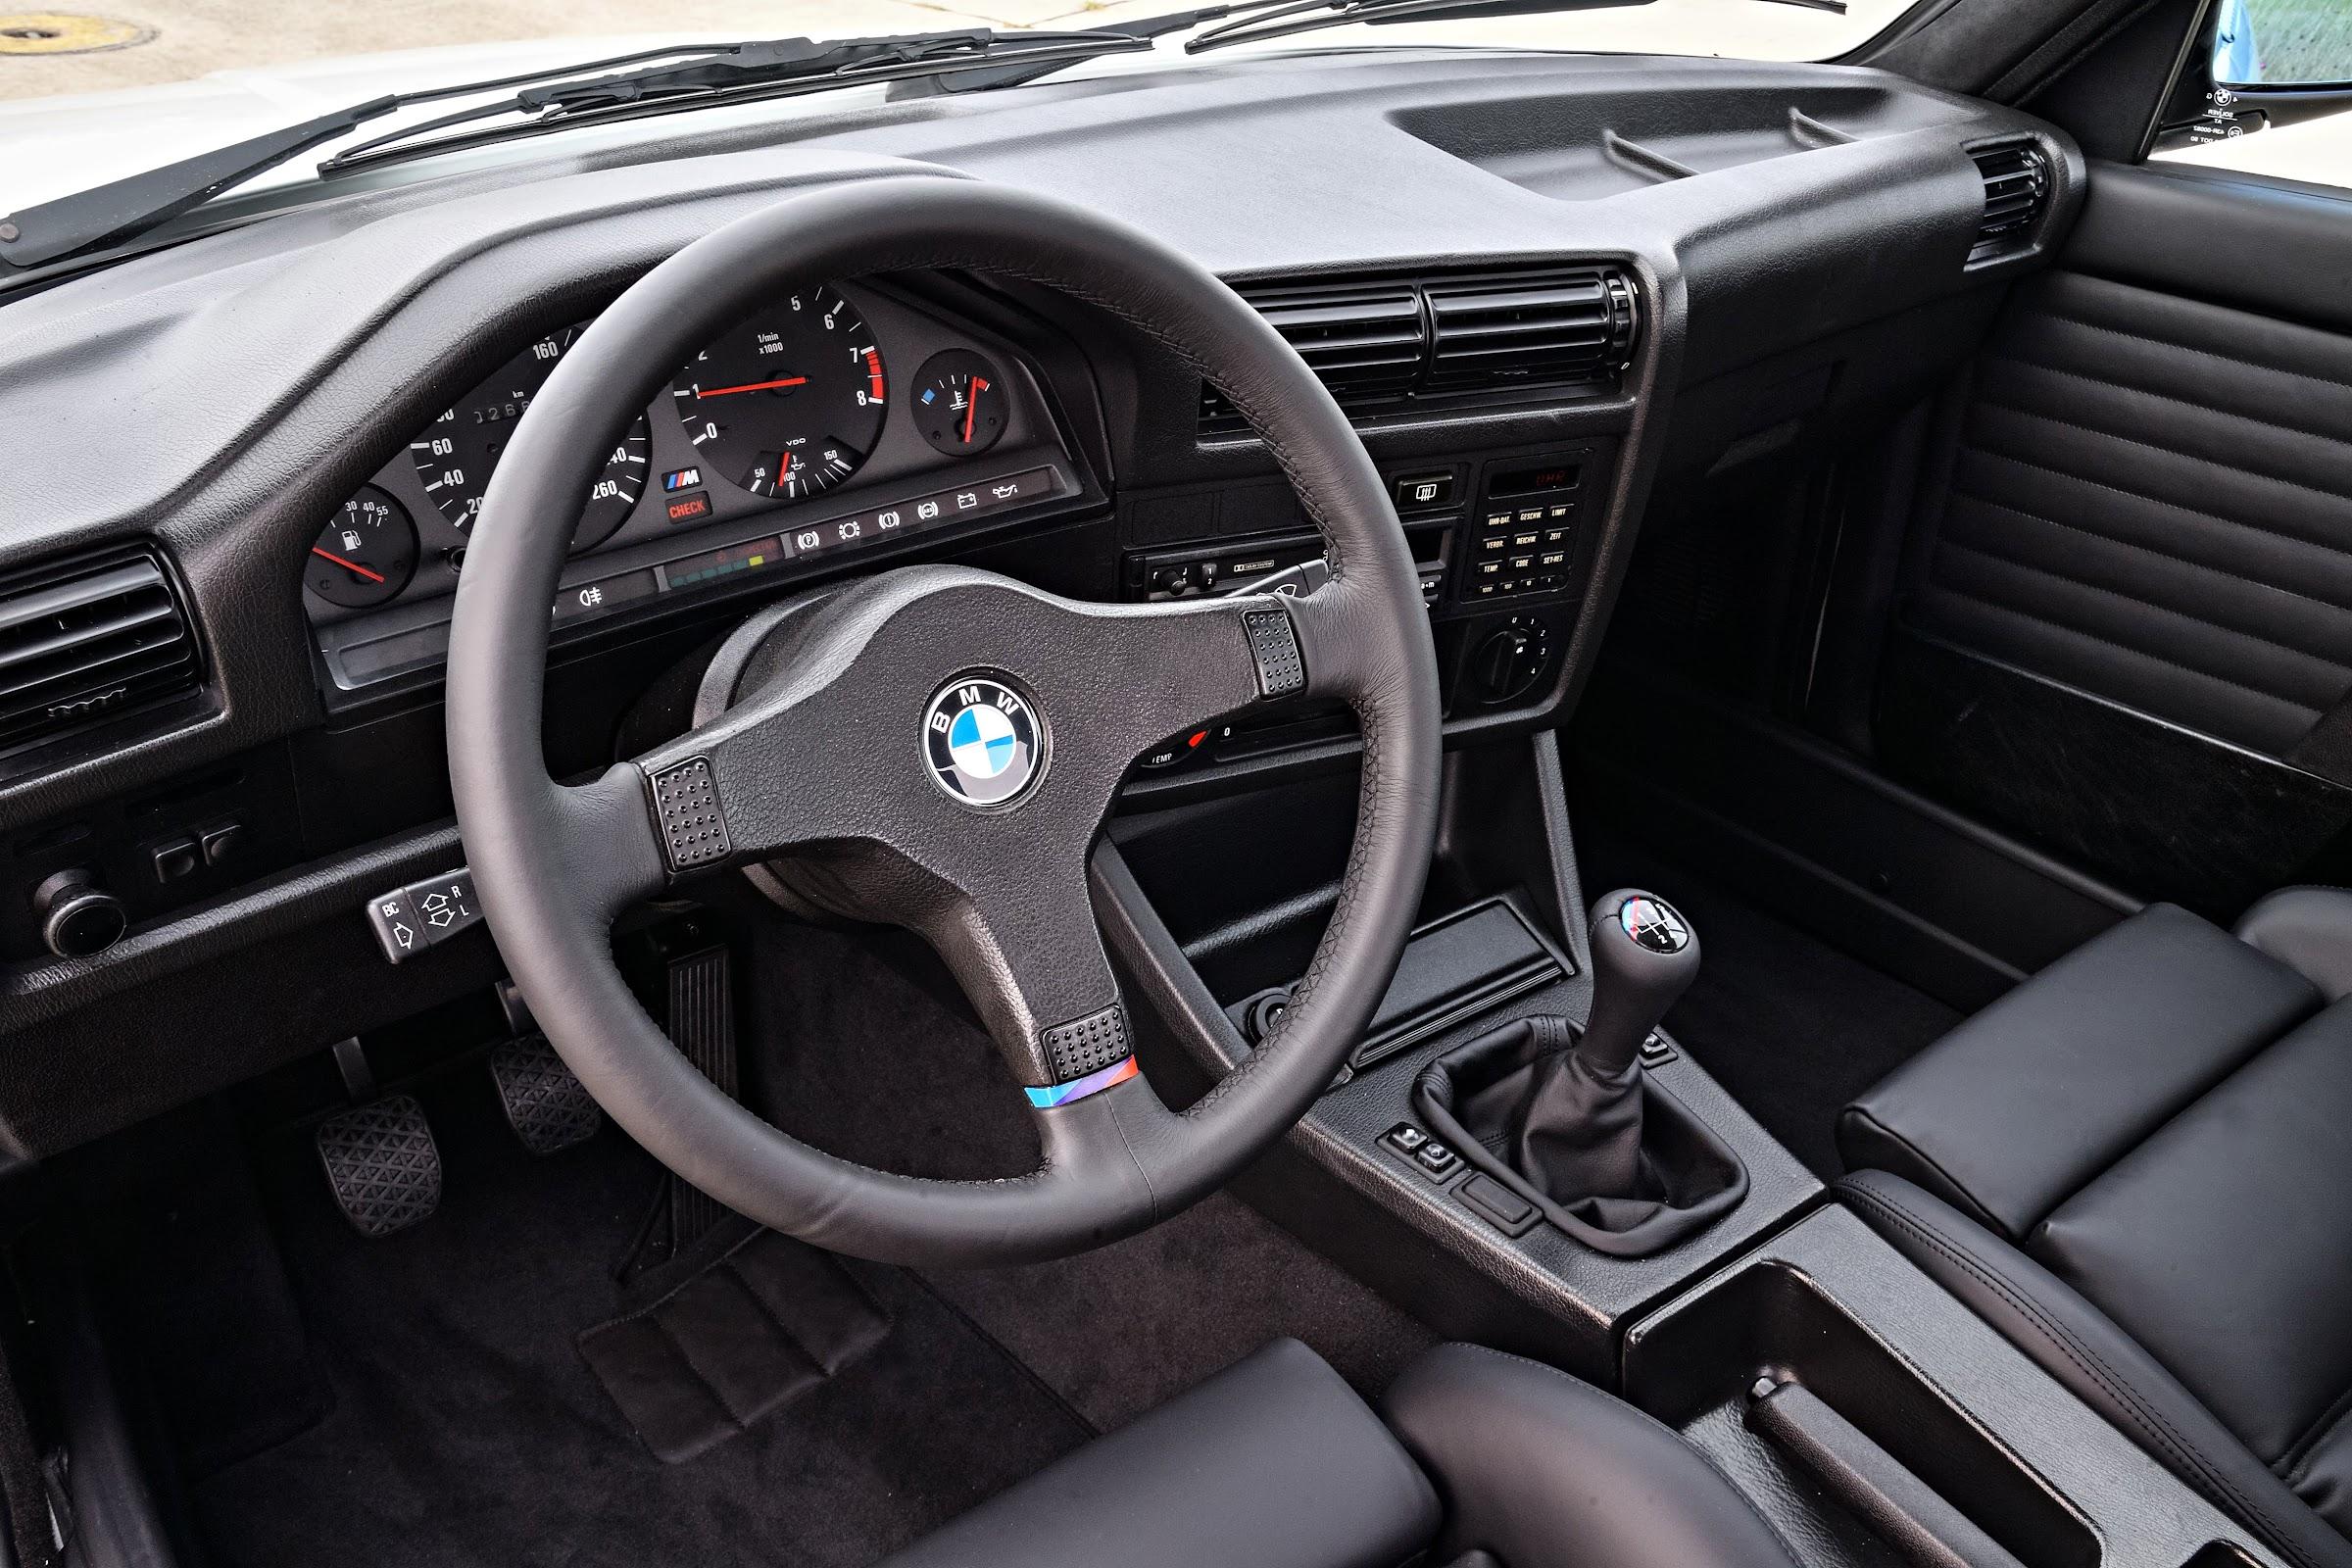 TbH0ok4HrrwtDjPq30lrtUDGpZU Wqq5x5h Vr4P0 lYkdlJ5qvJ2Uyf1M2yHcVISRWaBH9Io 3m9Zx9UPc3wVc  0nHb151DfACuTlzyXc7ZGdrlLOOLScdniwReeVx OH3xYjh4A=w2400 - Los prototipos del BMW M3 más curiosos